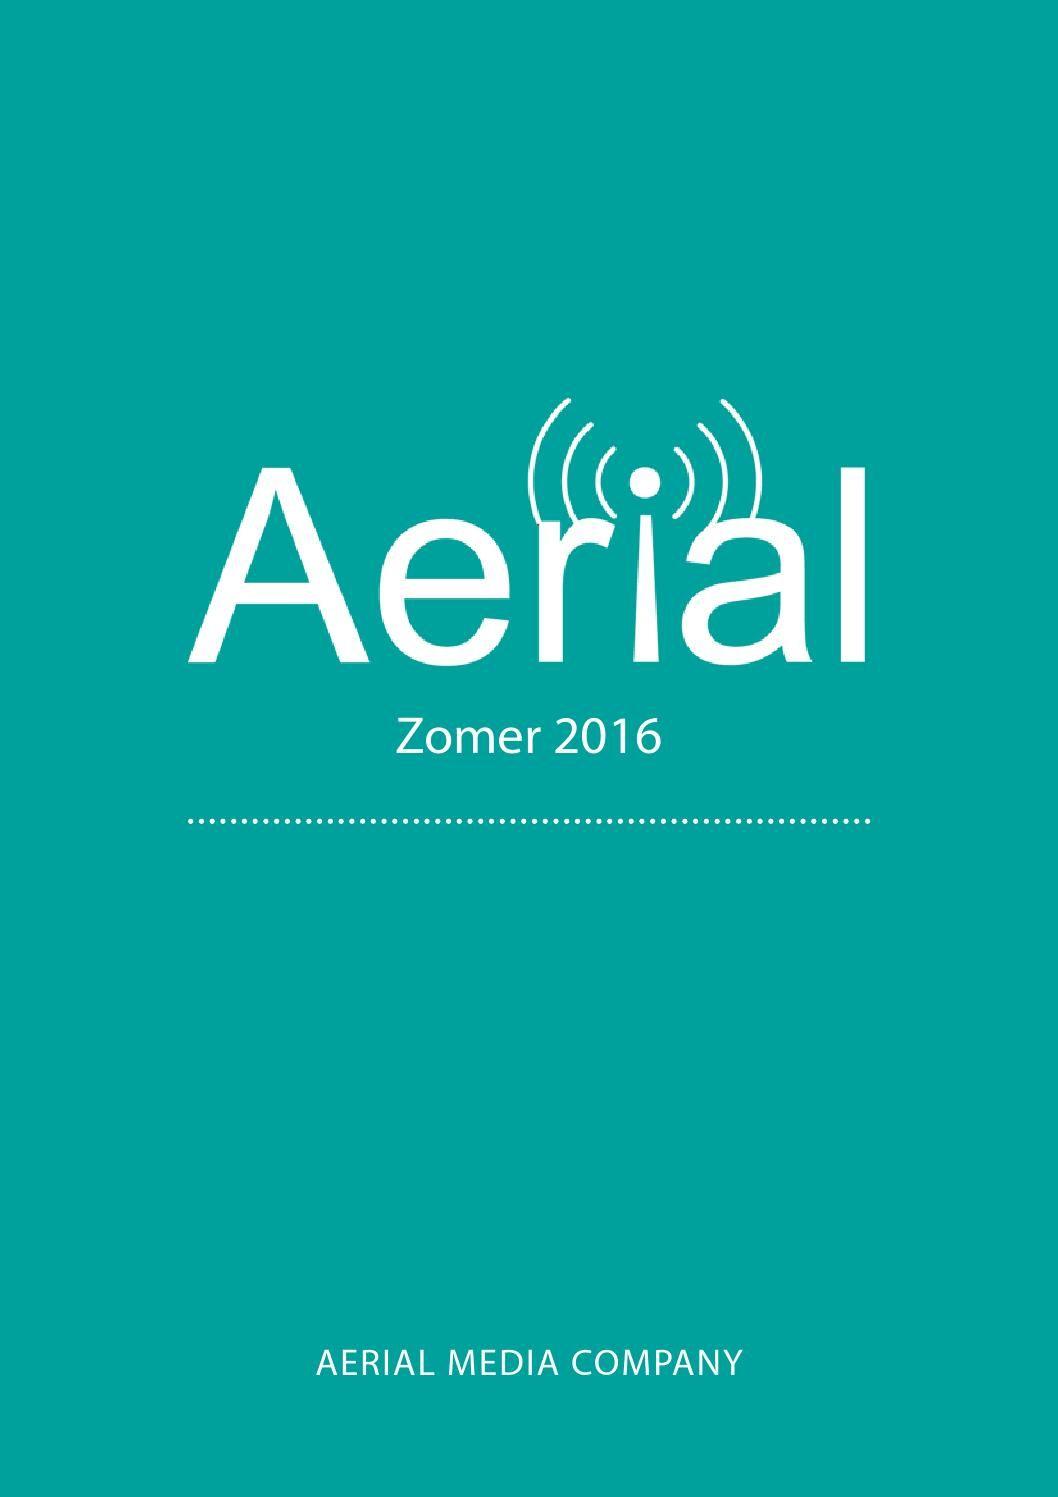 Aerial zomer 2016 by Aerial Media Company - issuu